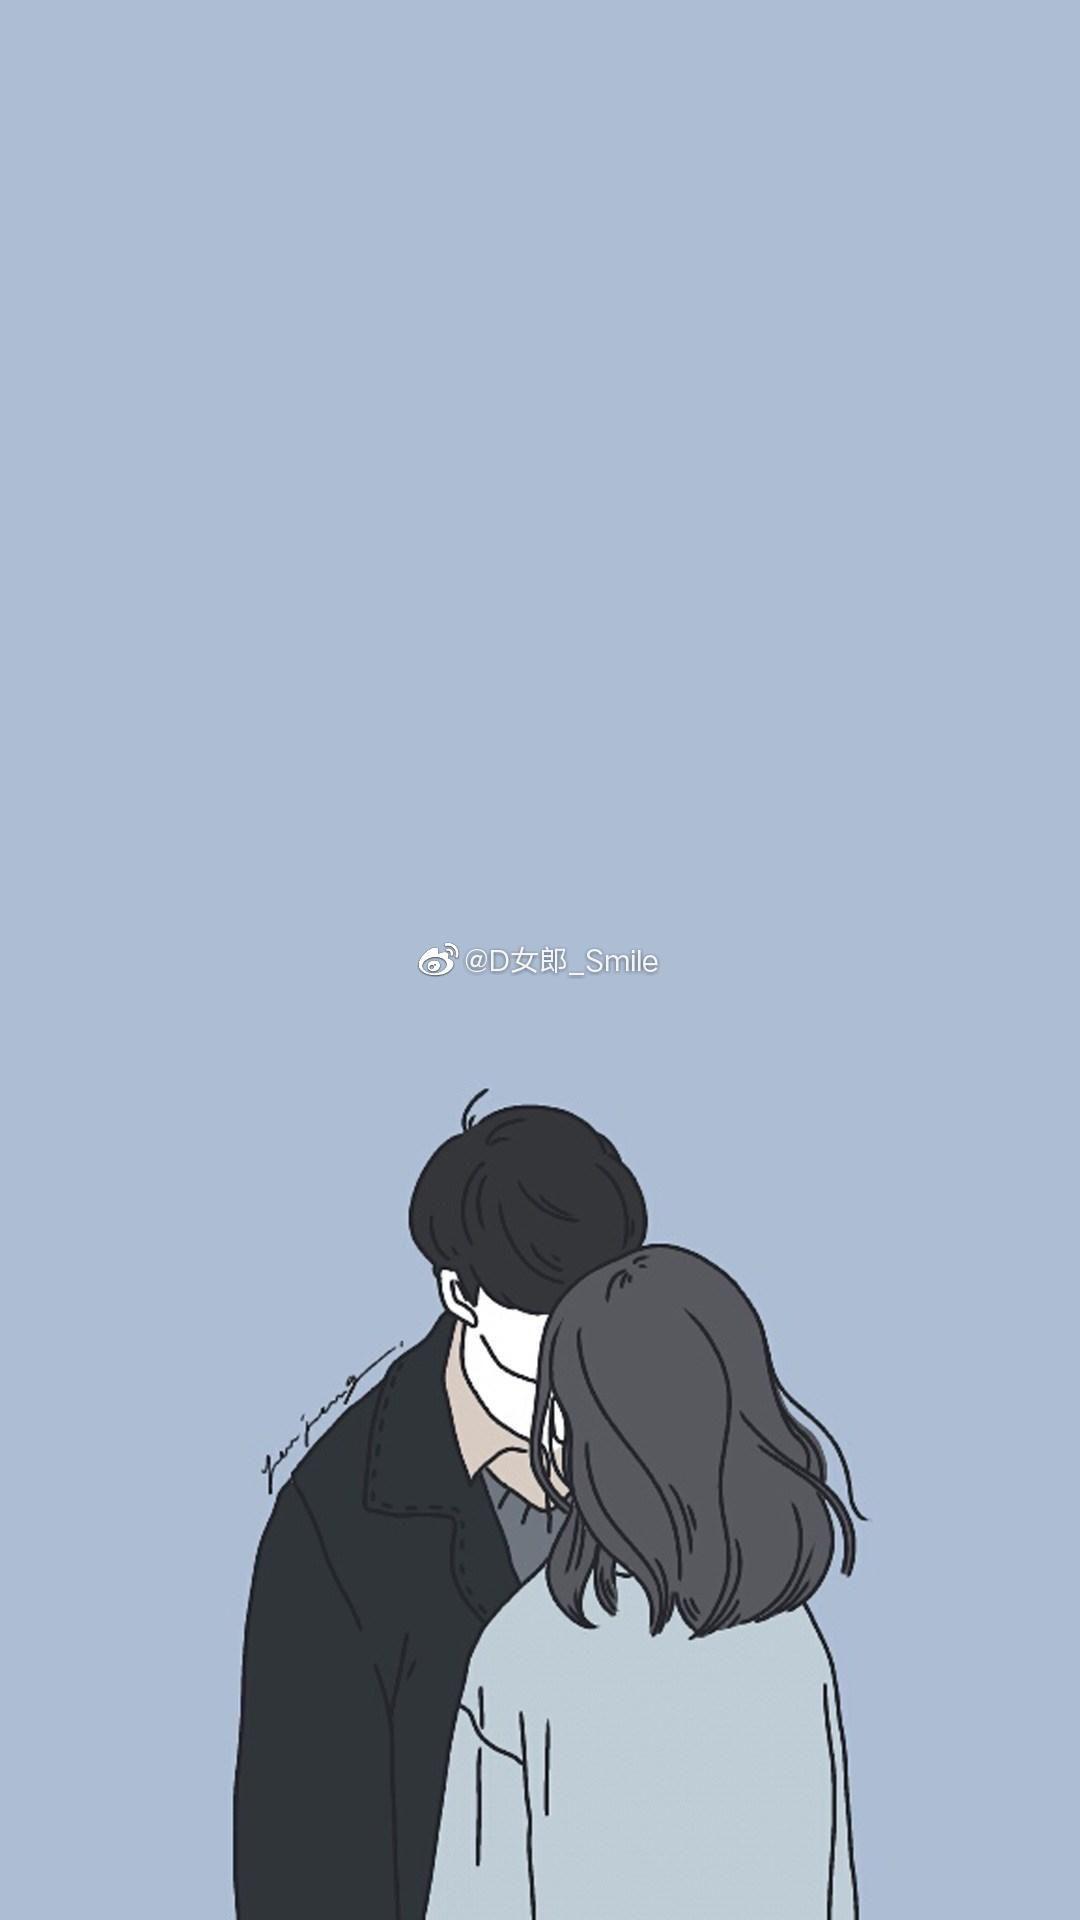 Aesthetic Anime Couple Wallpapers   Top Aesthetic Anime 1080x1920